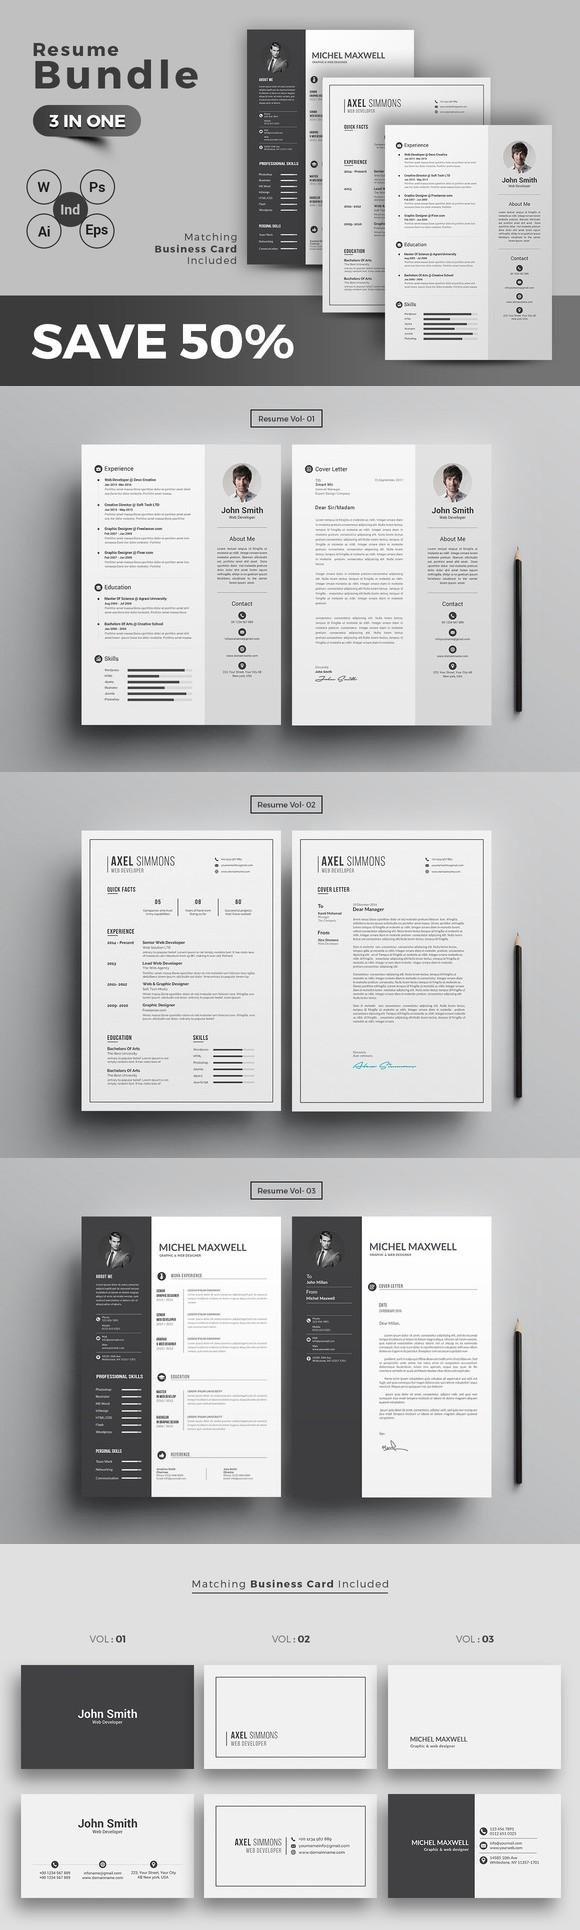 ResumeCV Bundle ResumeCV Bundle Resume cv